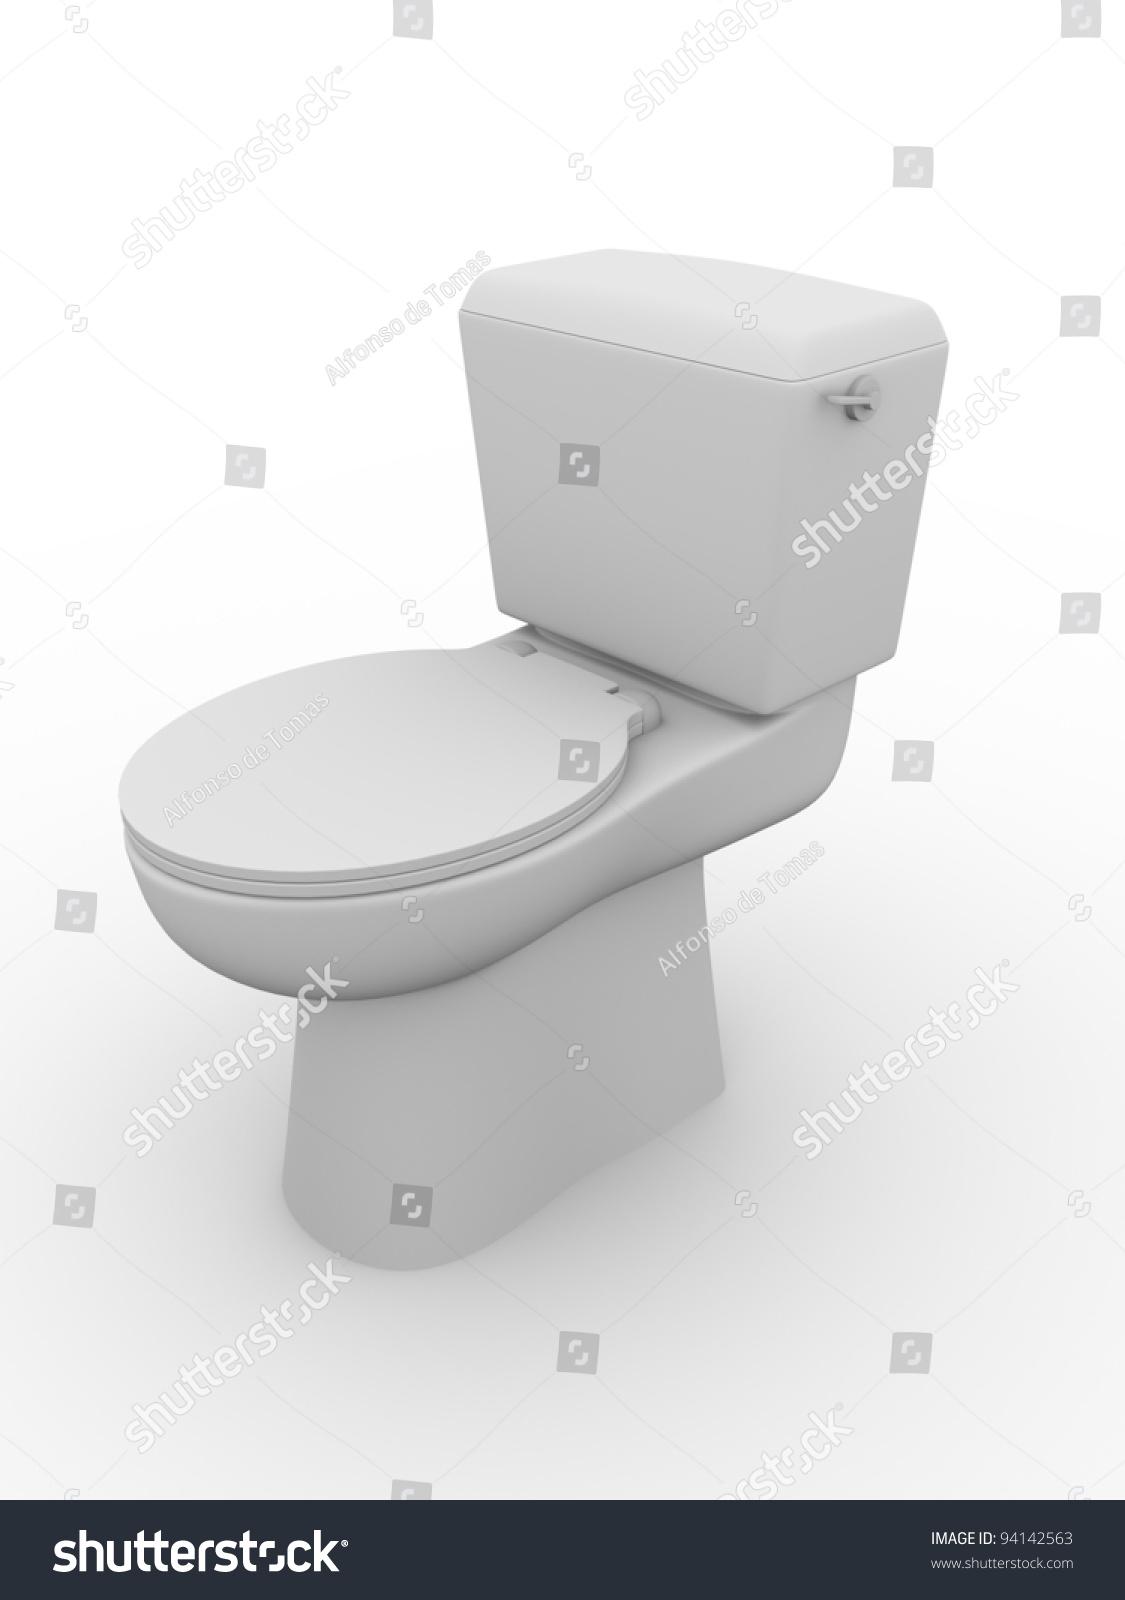 Closed toilet bowl  Bathroom equipment  Water closet  WC. Closed Toilet Bowl Bathroom Equipment Water Stock Illustration